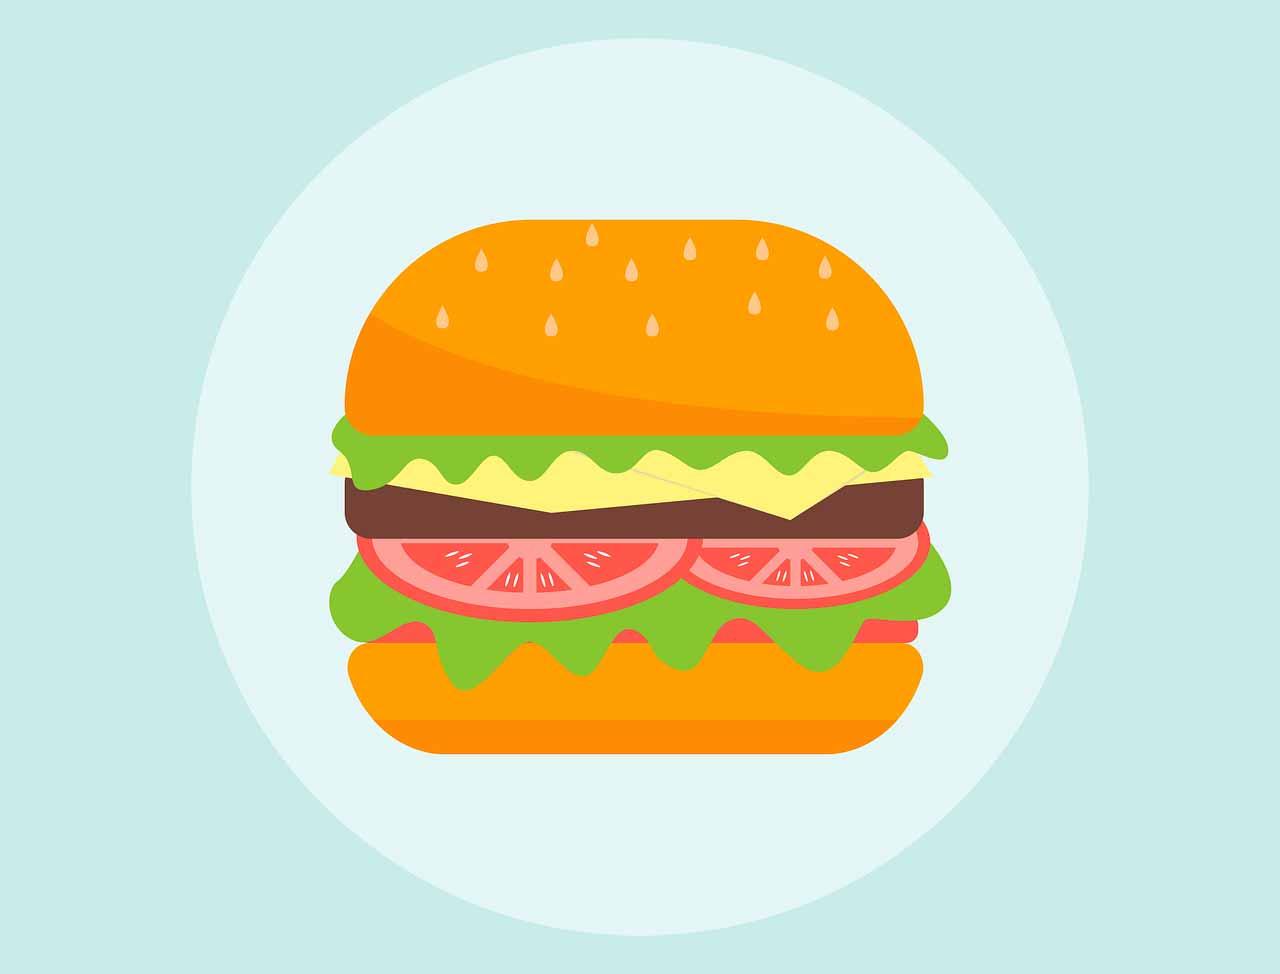 Une illustration représentant un hamburger